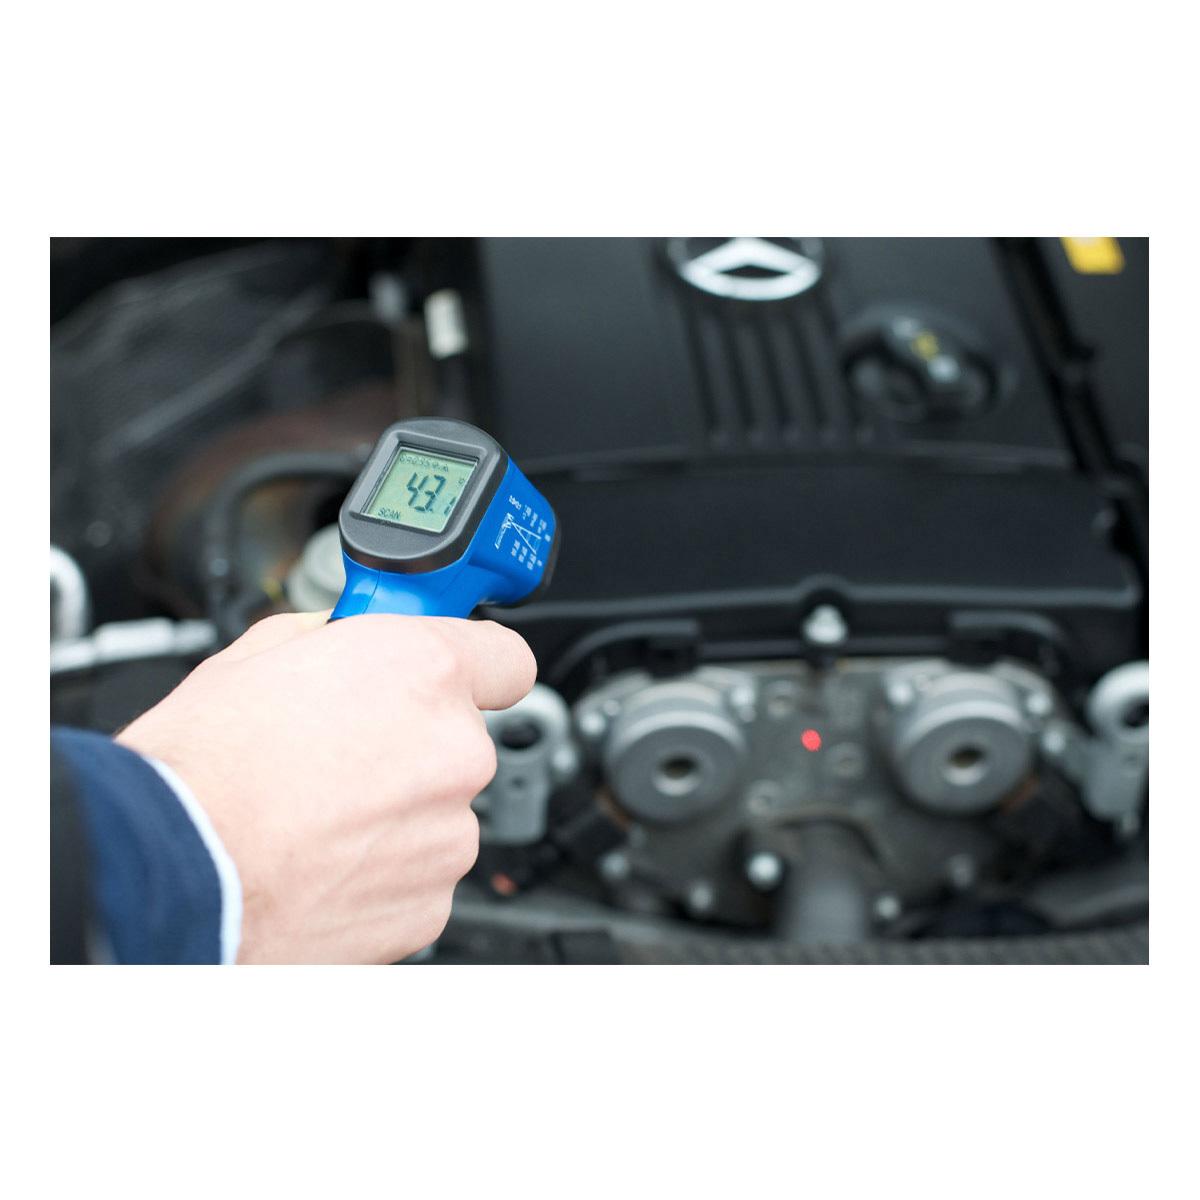 31-1134-06-infrarot-thermometer-scantemp-330-anwendung1-1200x1200px.jpg